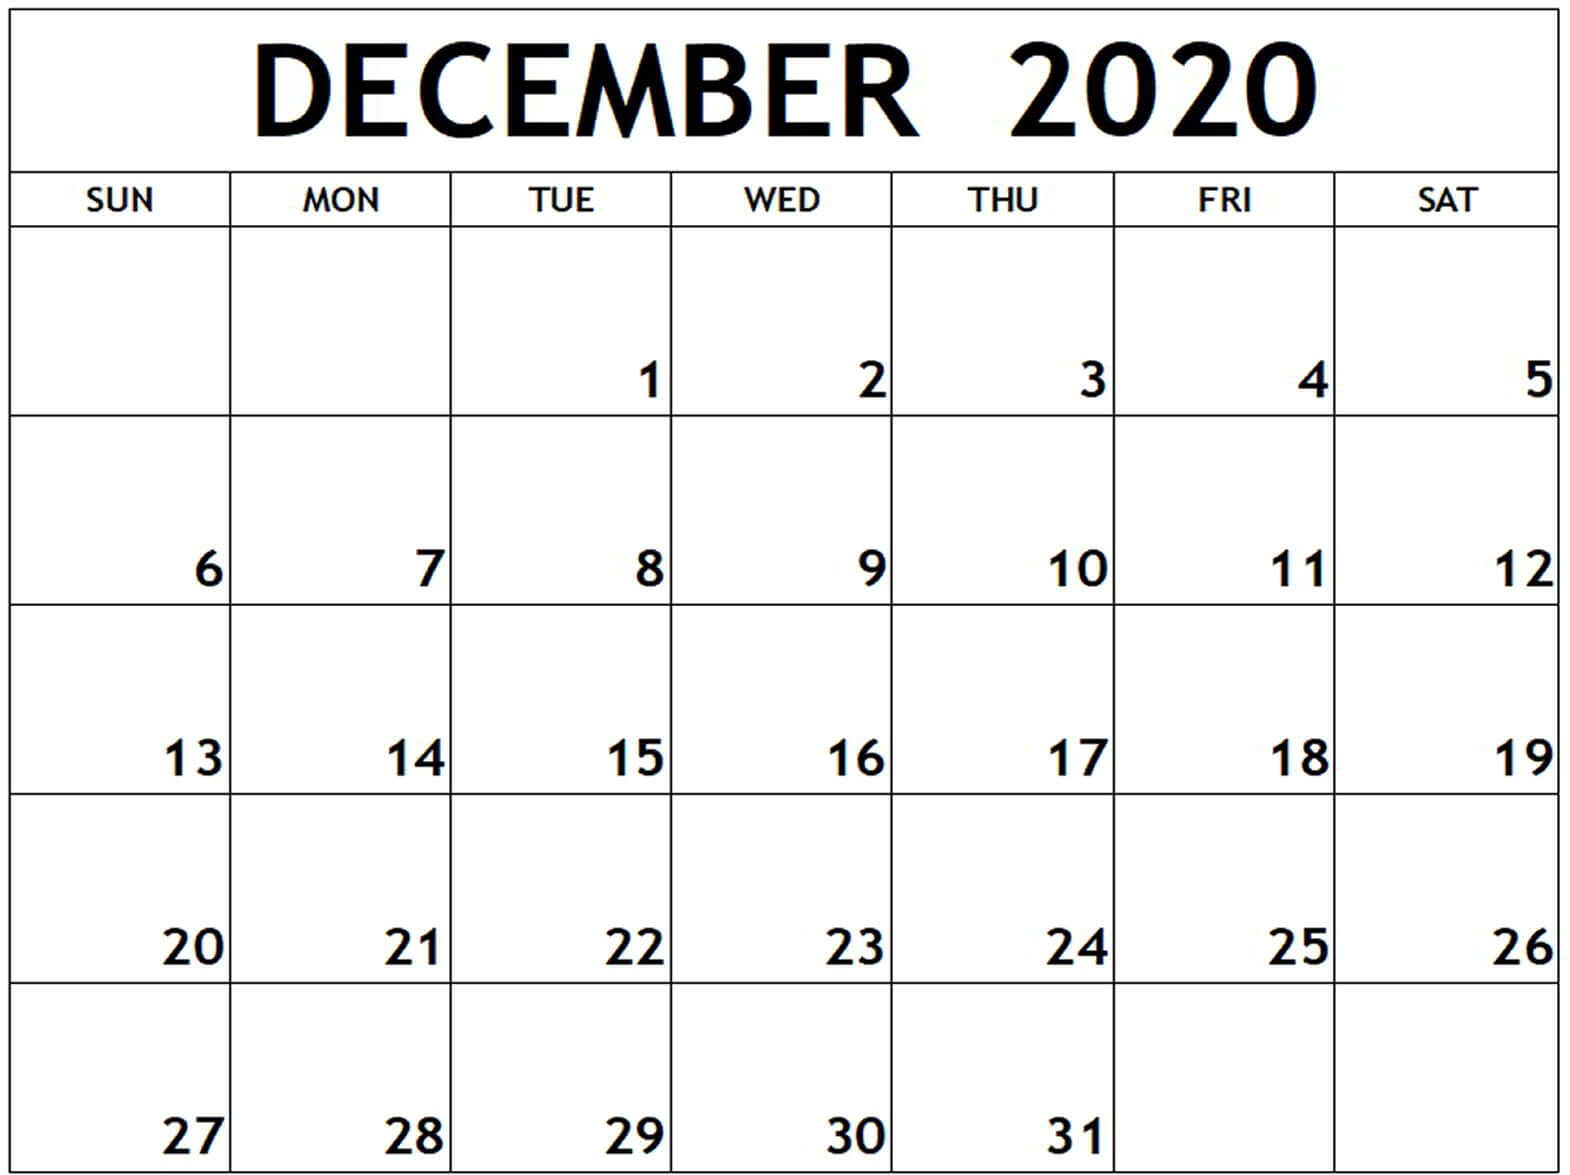 Blank December 2020 free printable calendar